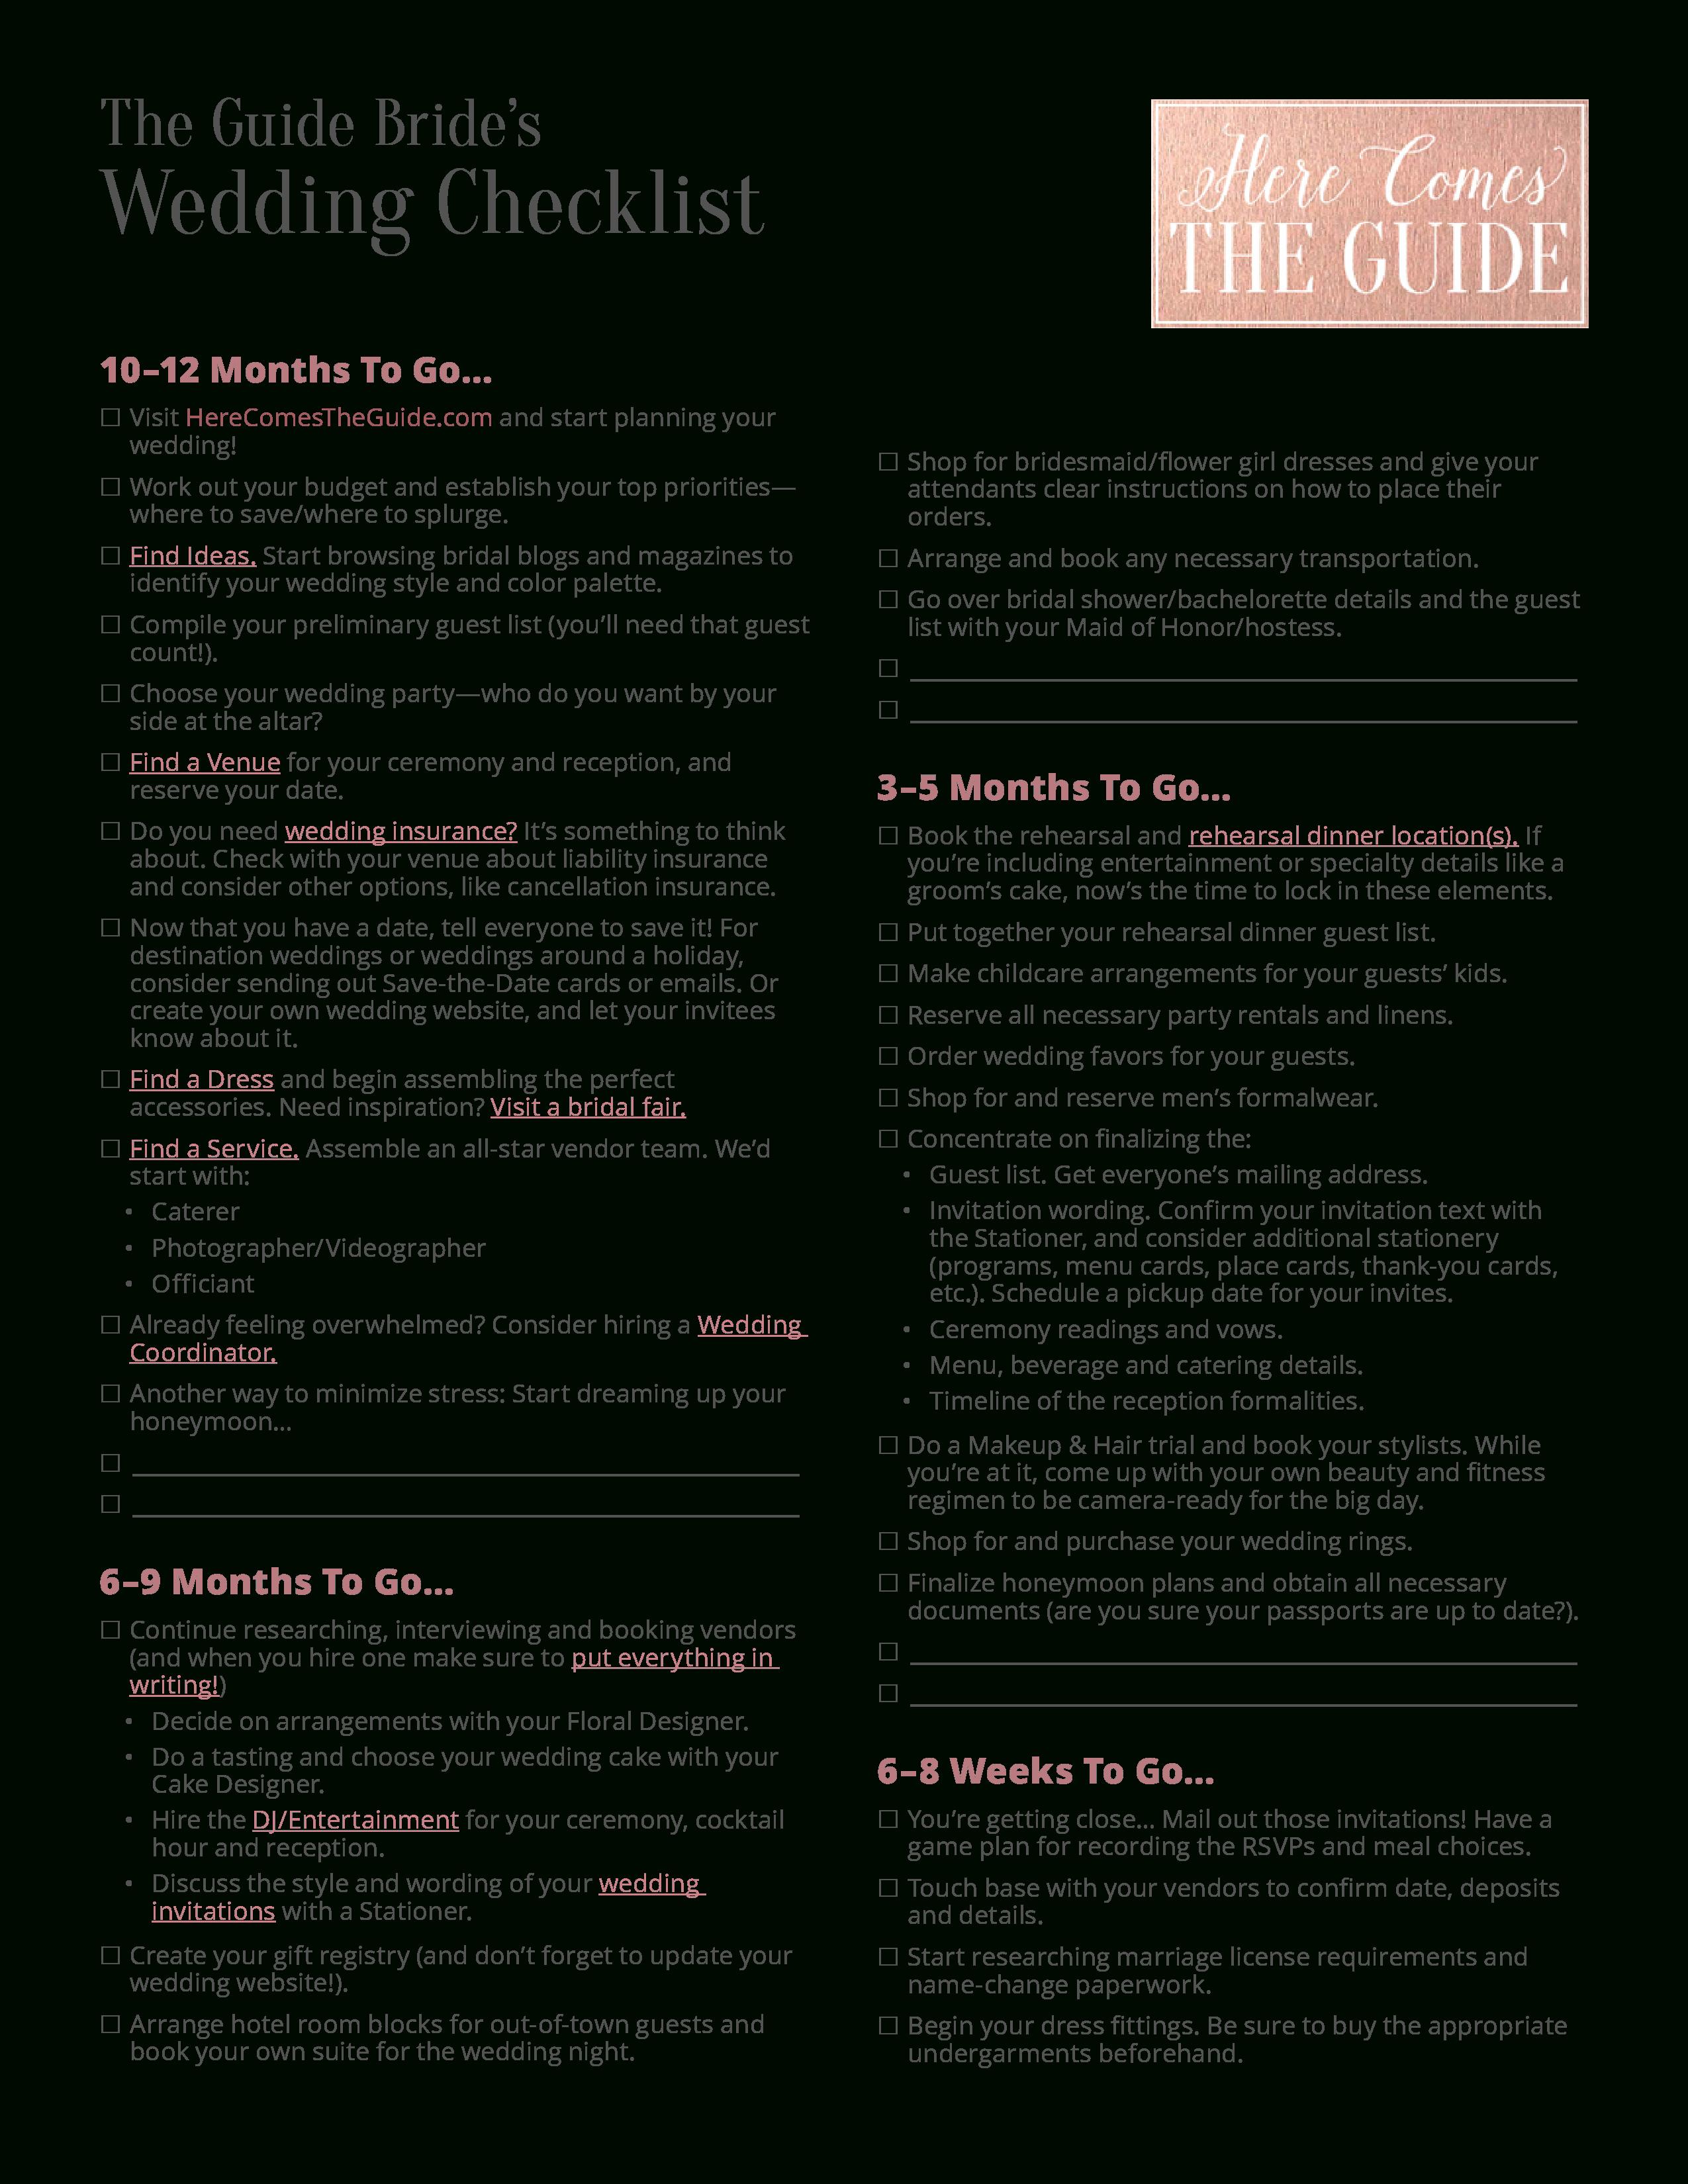 Free Printable Wedding Party Checklist | Templates At - Free Printable Wedding Party List